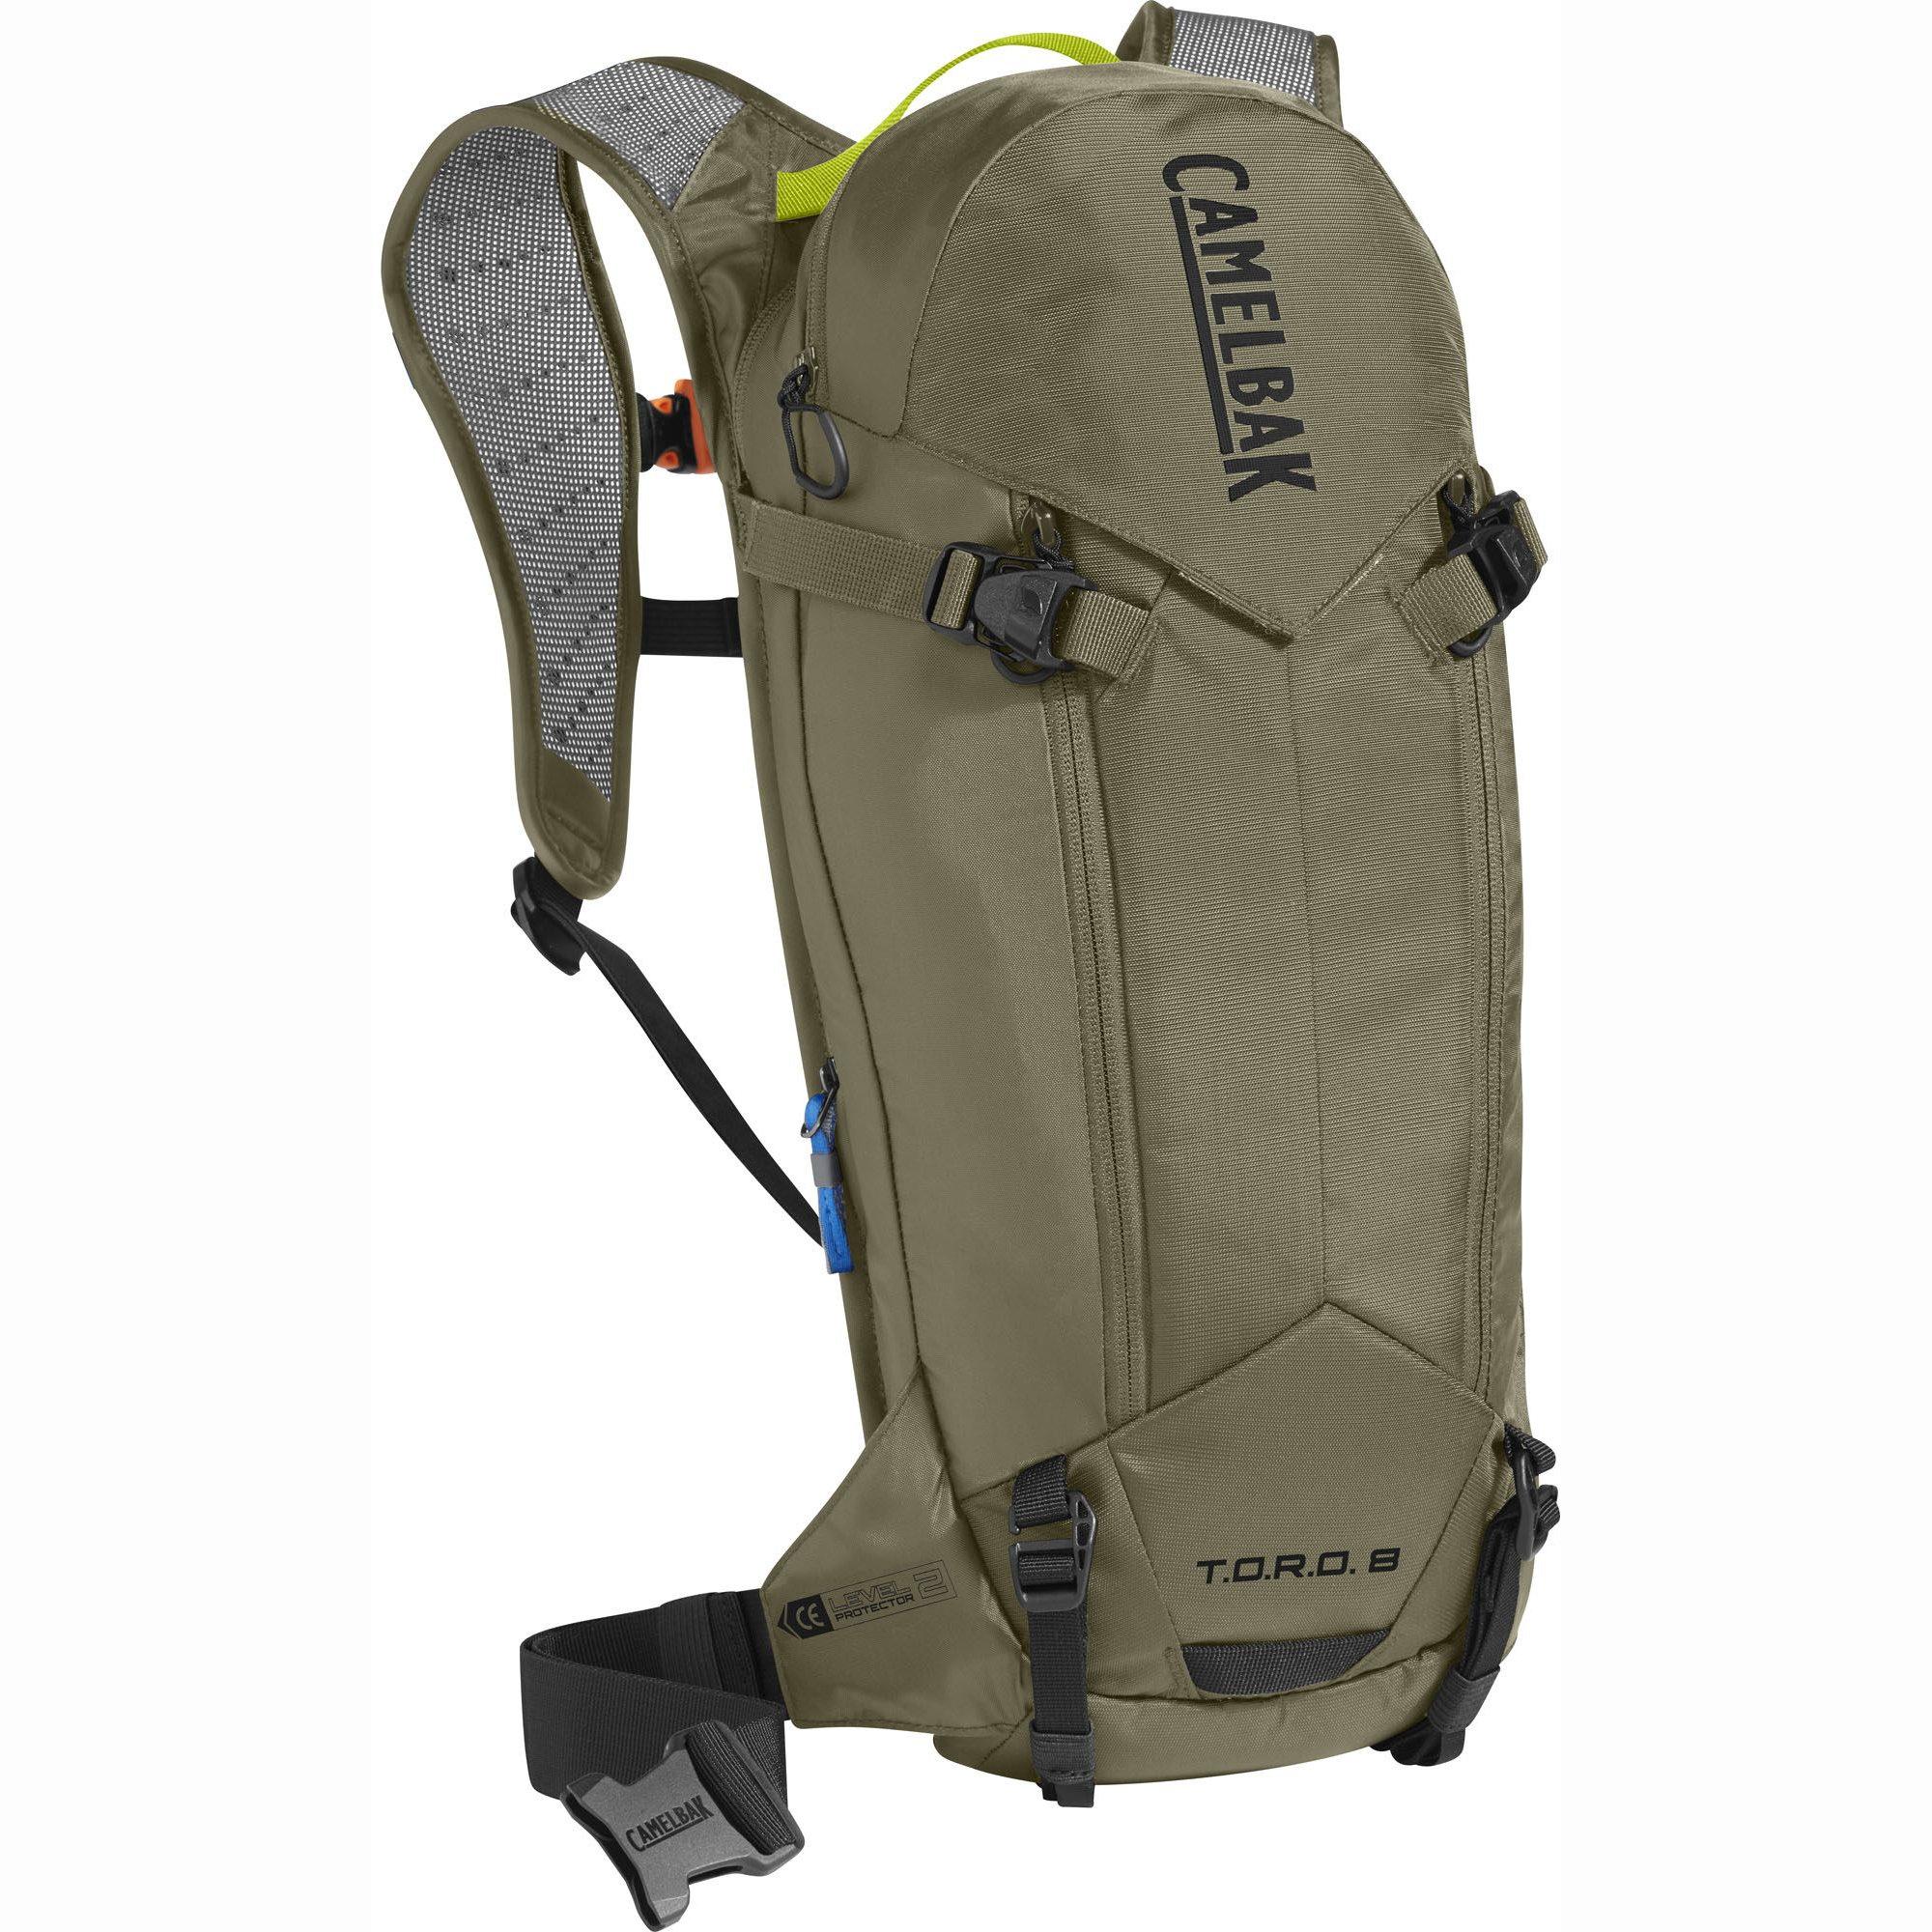 Plecak rowerowy   Camelbak T.O.R.O. Protector 8 za £52.00